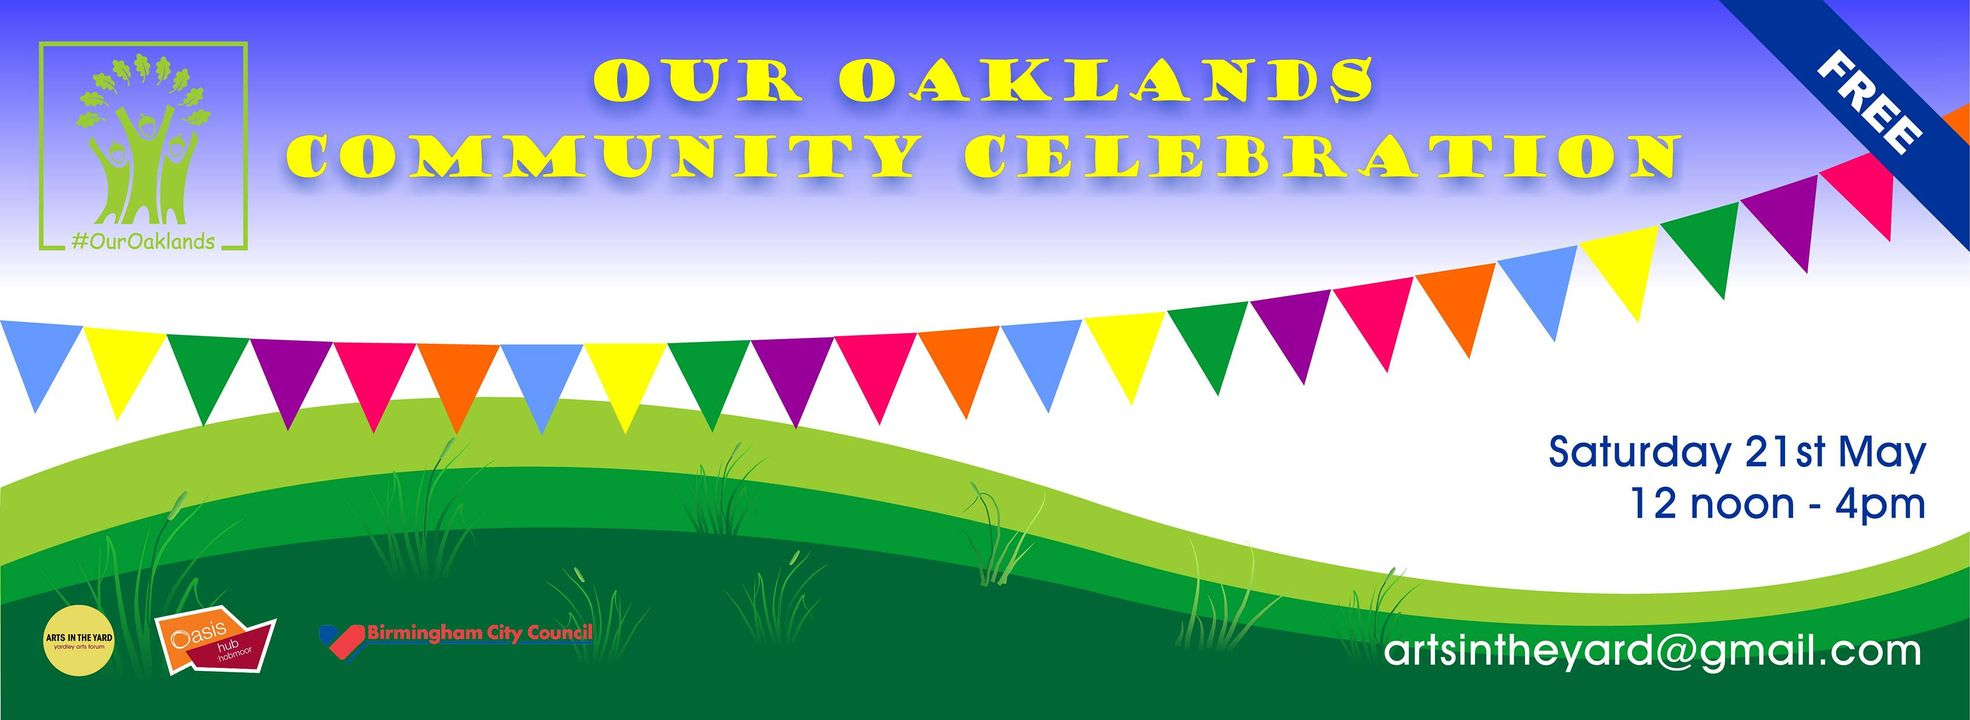 Our Oaklands 2016